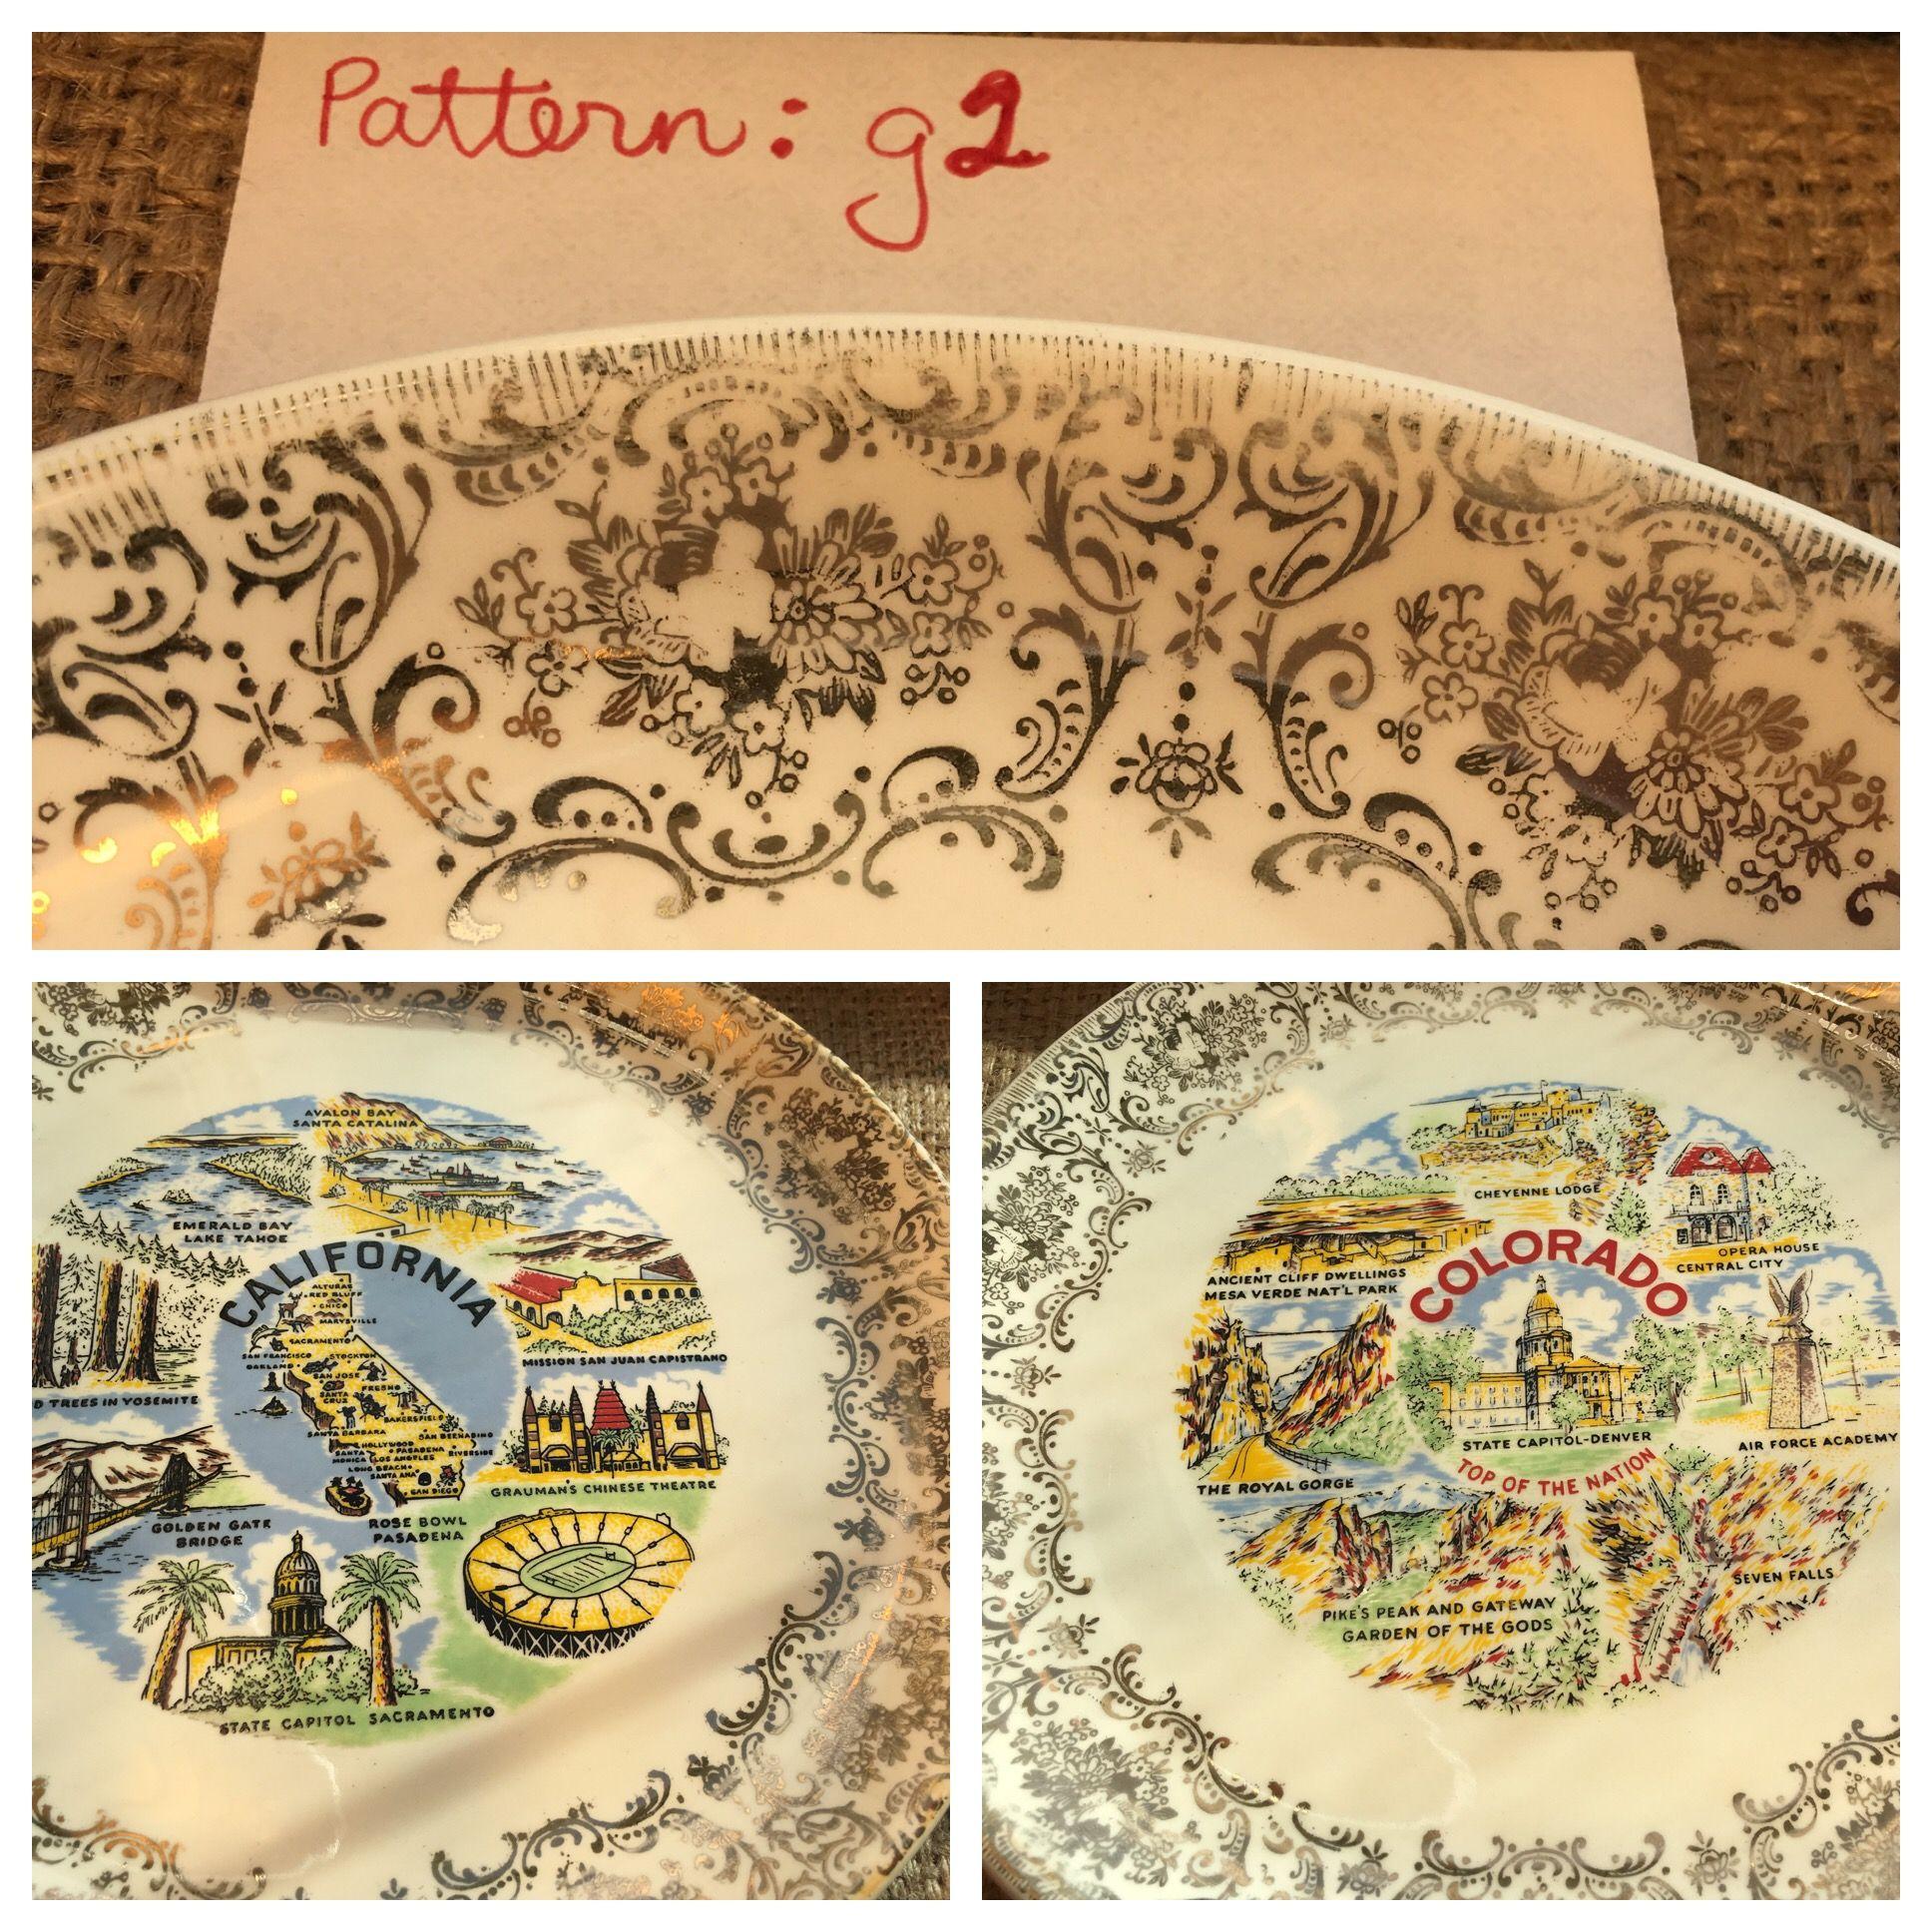 Pin by cat braun on plate pattern g g on white pinterest